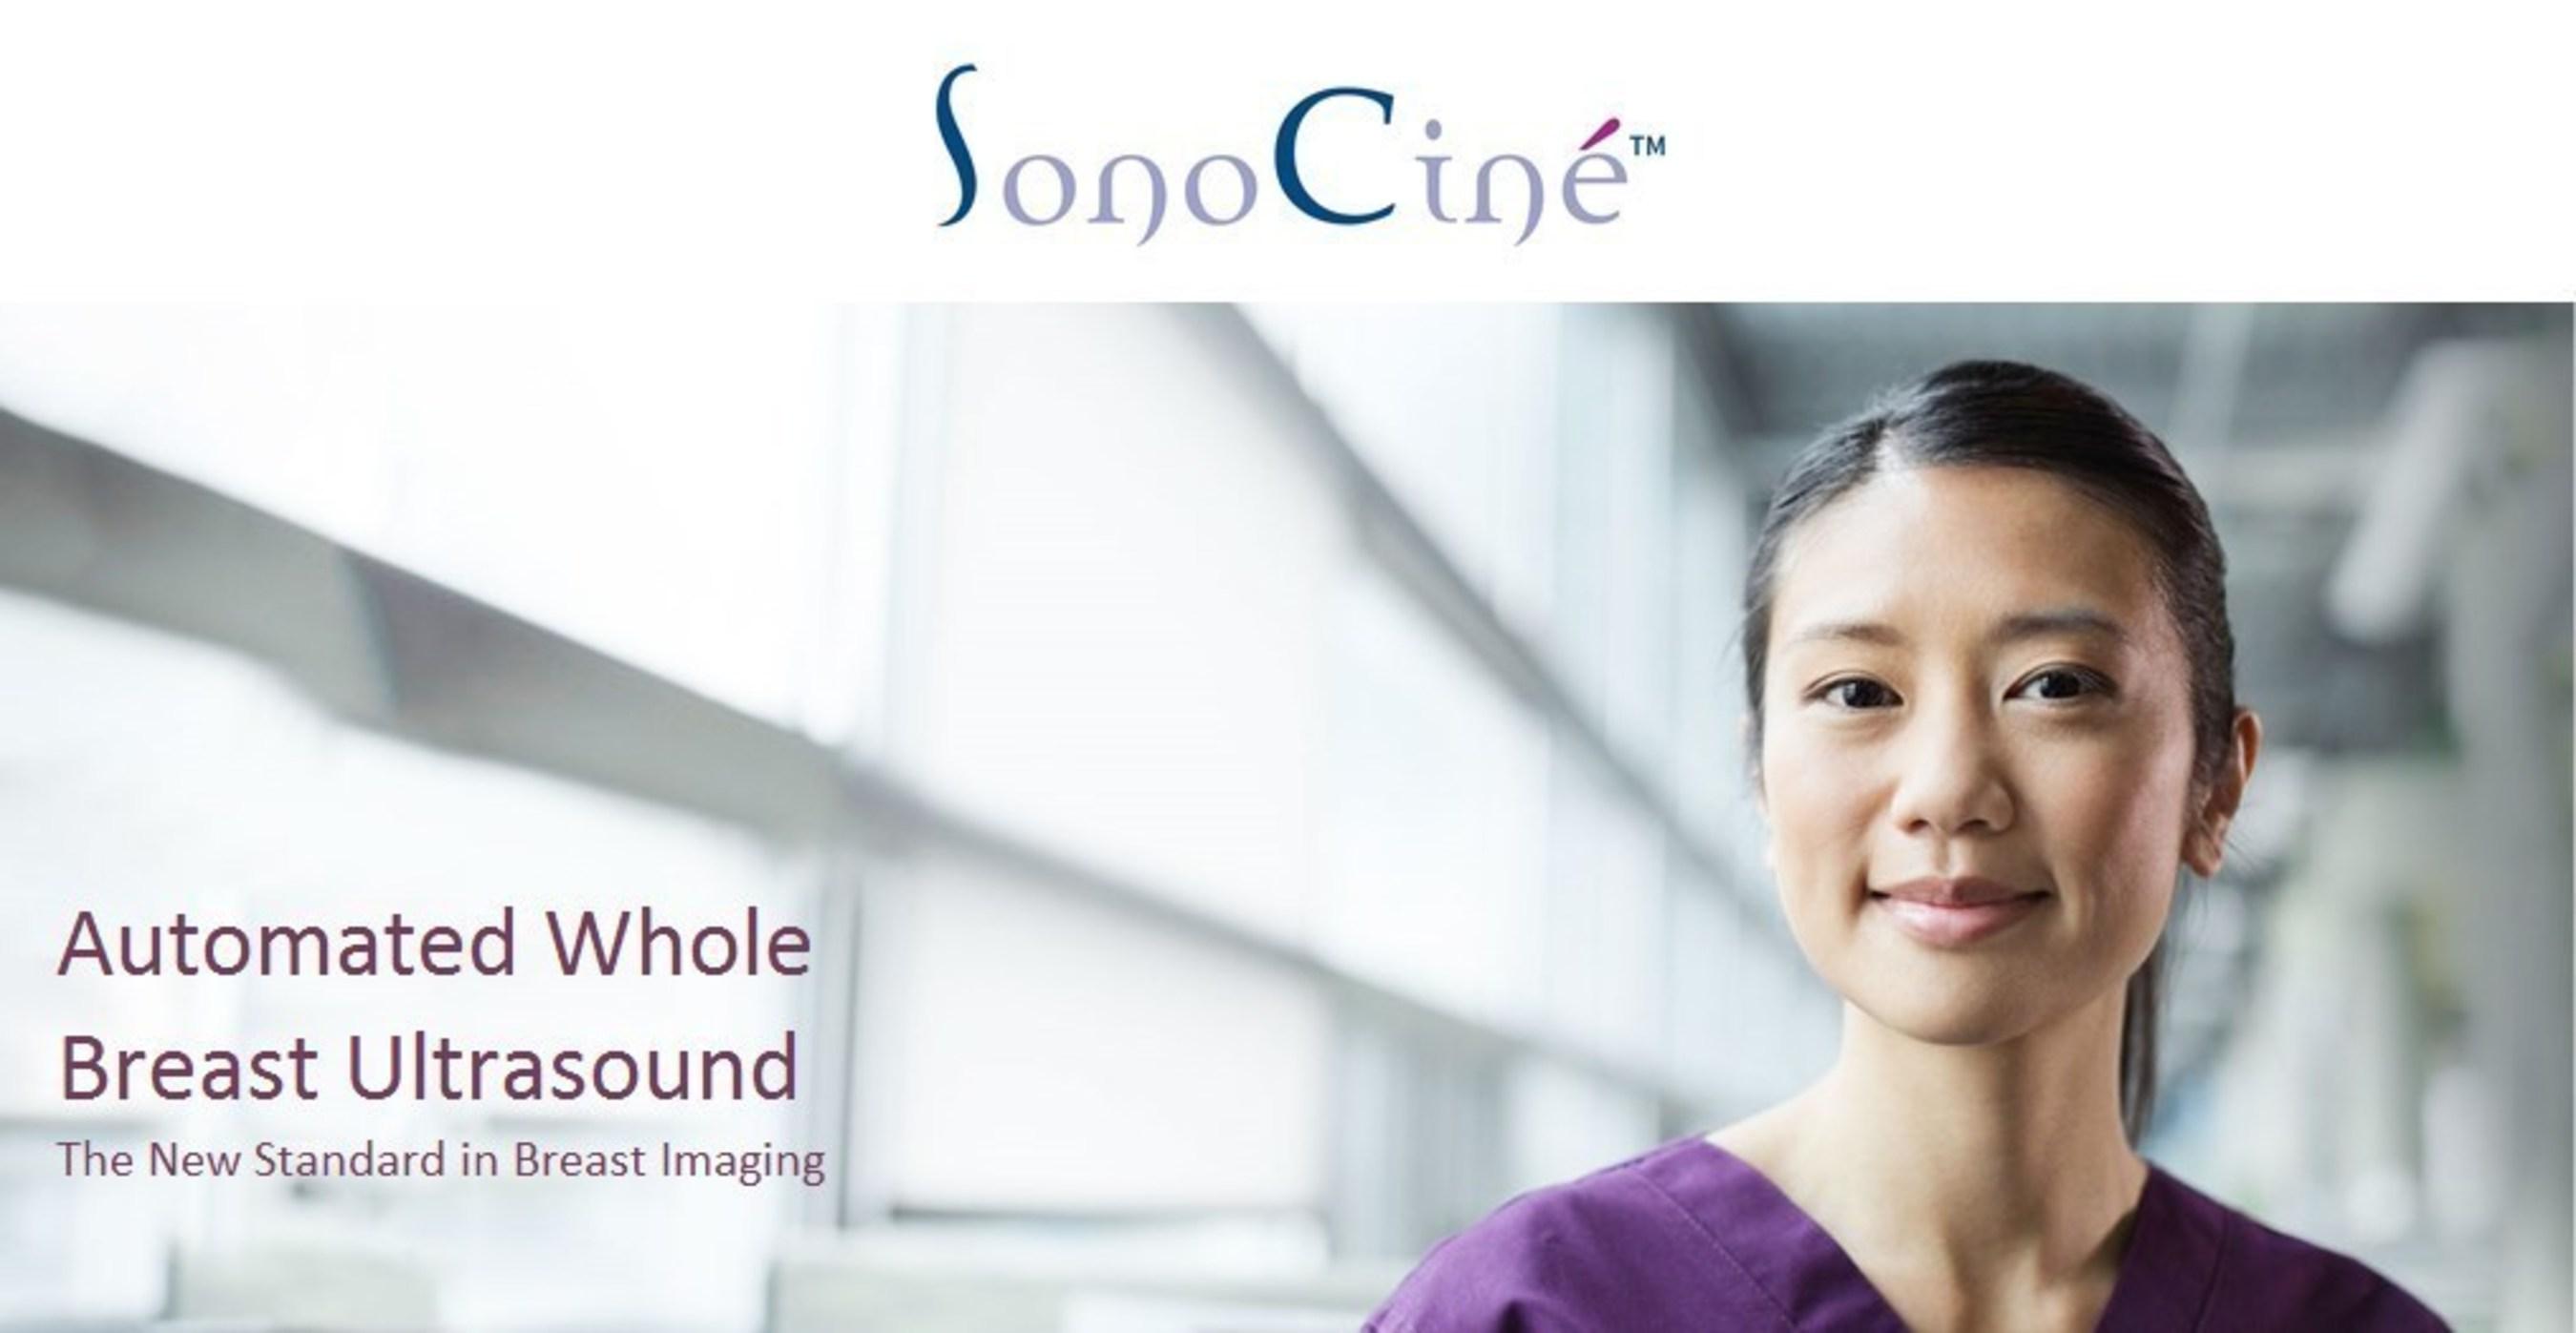 SonoCine Releases 3D Multiplanar Reconstruction Software to Improve Breast Cancer Detection